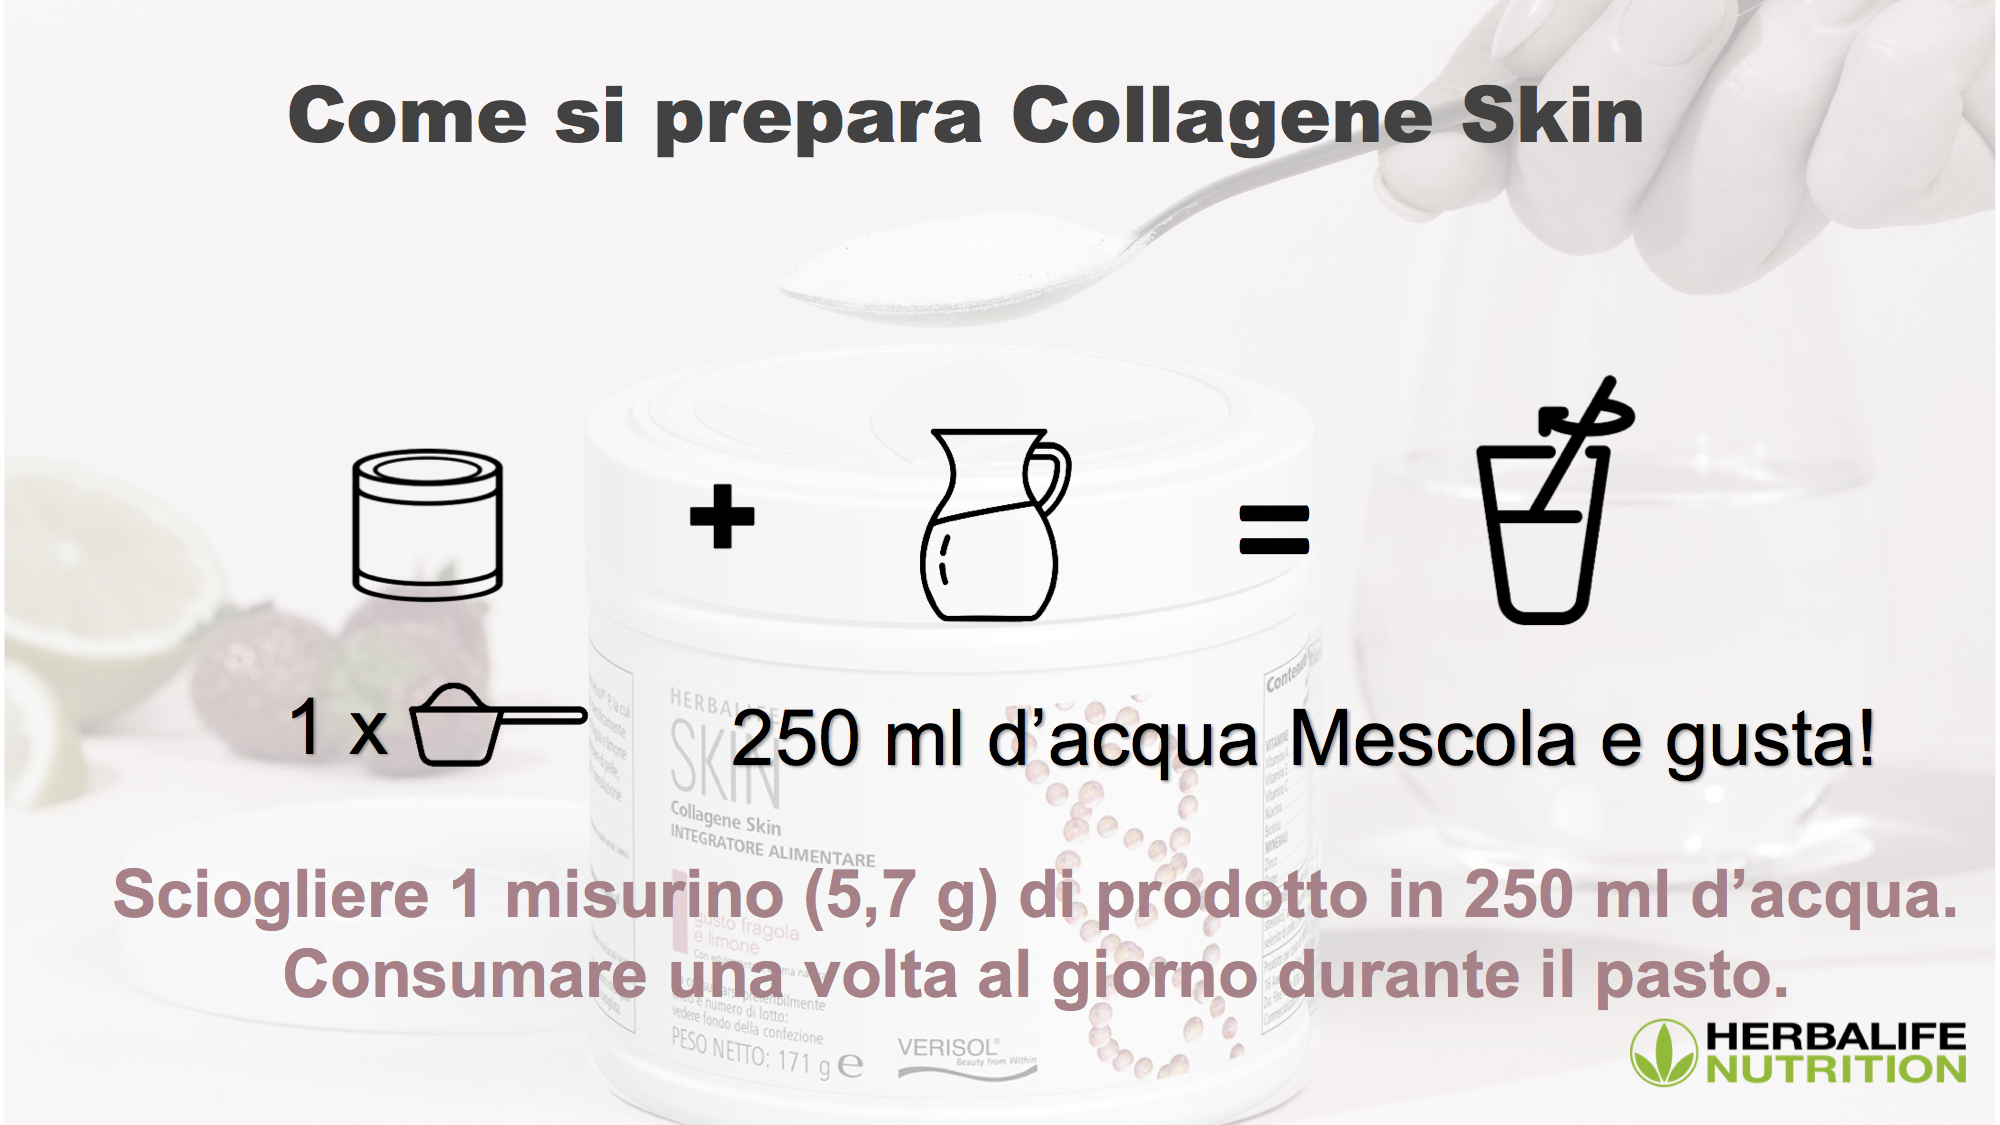 Collagene skin